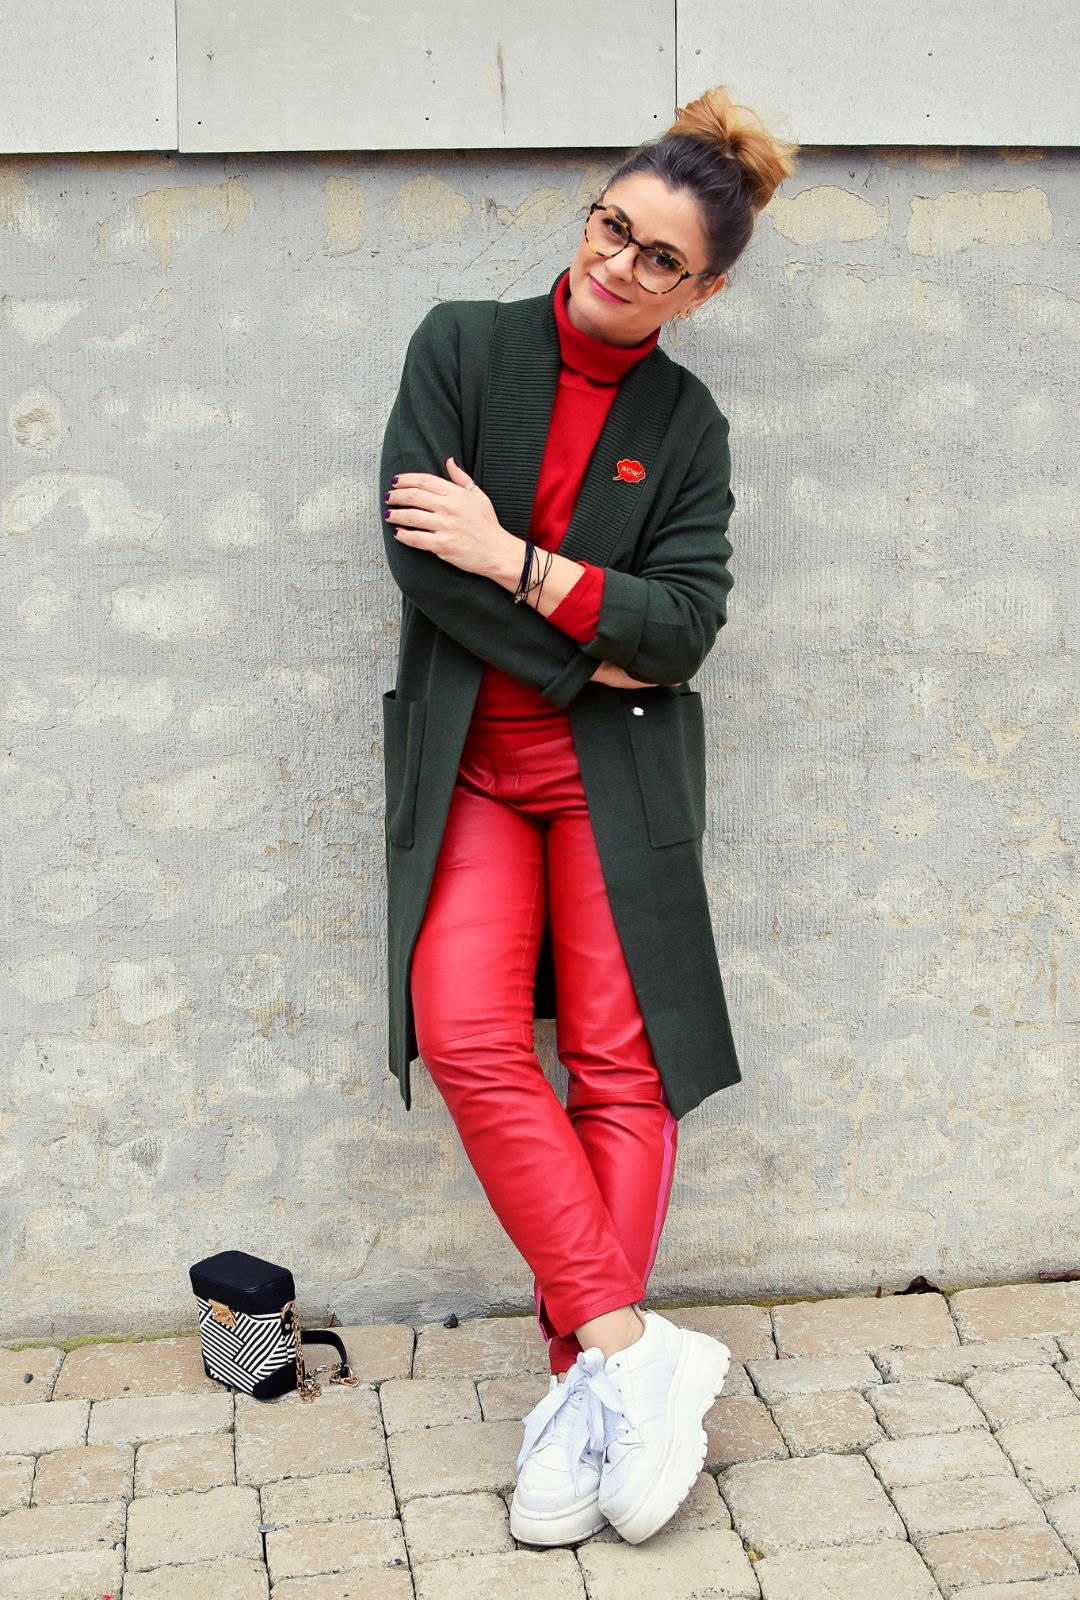 Rotes-Leder-kombinieren-1